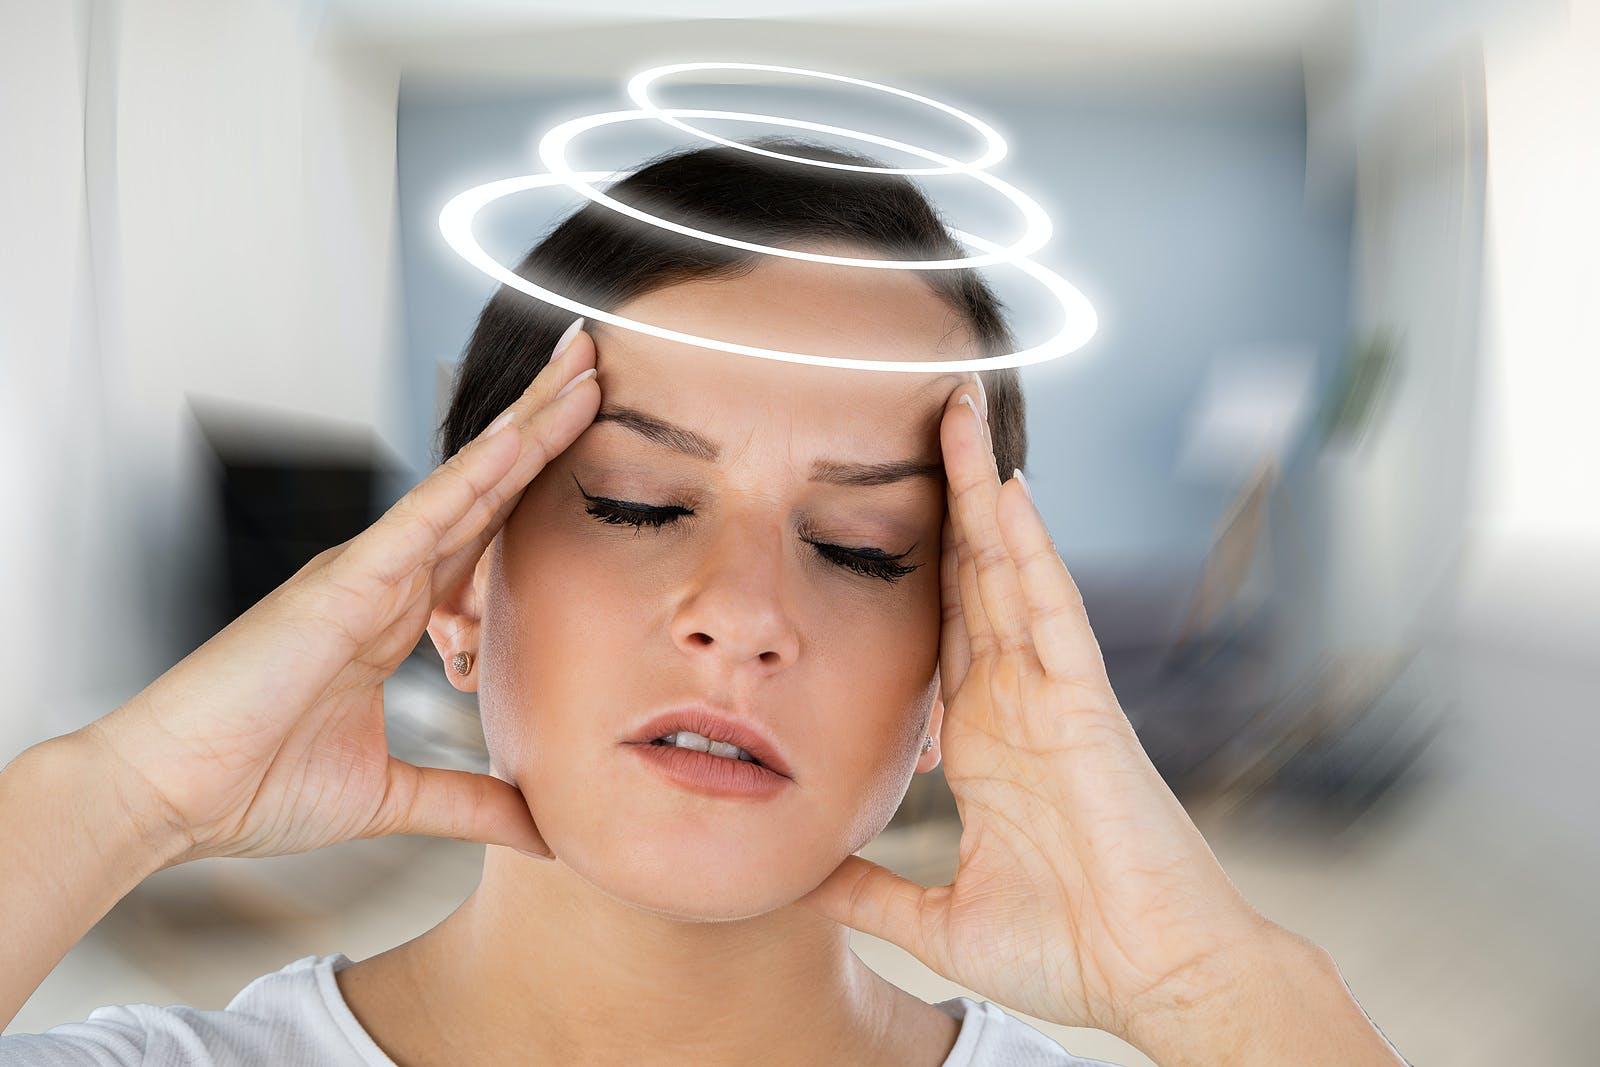 Woman with BPPV vertigo and spinning head